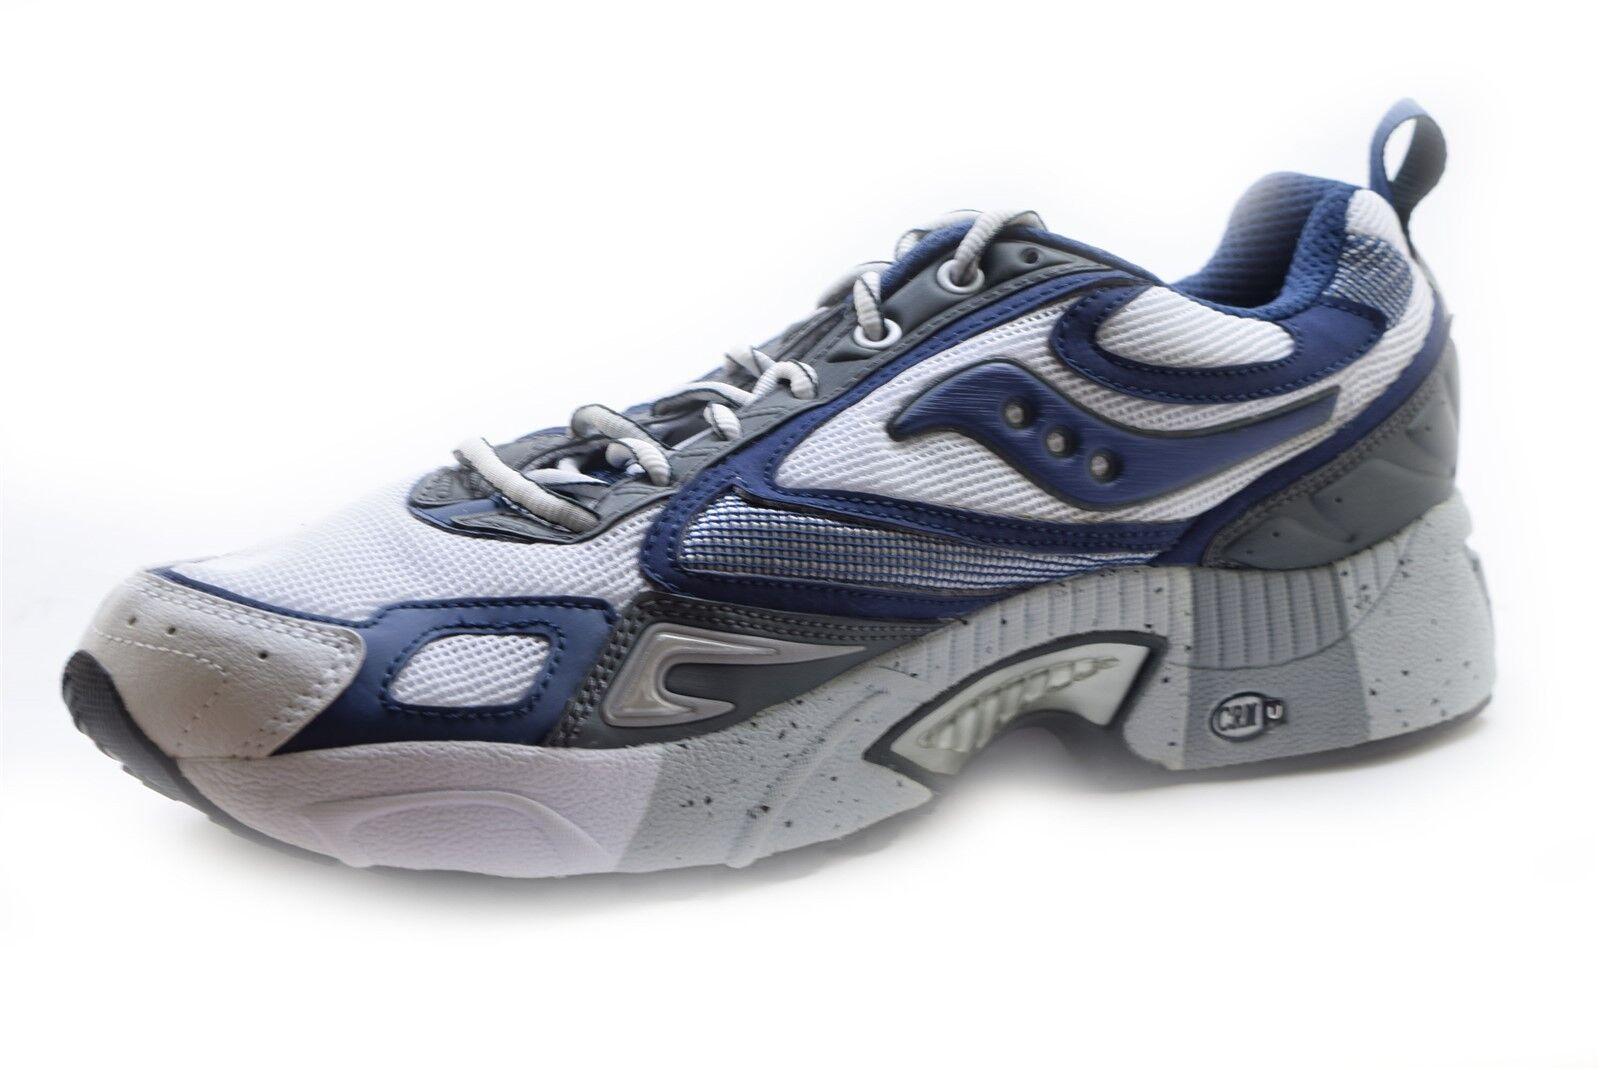 Saucony Men's Grid Omni 3 Running Shoes White/Navy/Grey Size 12.5 MED - NIB